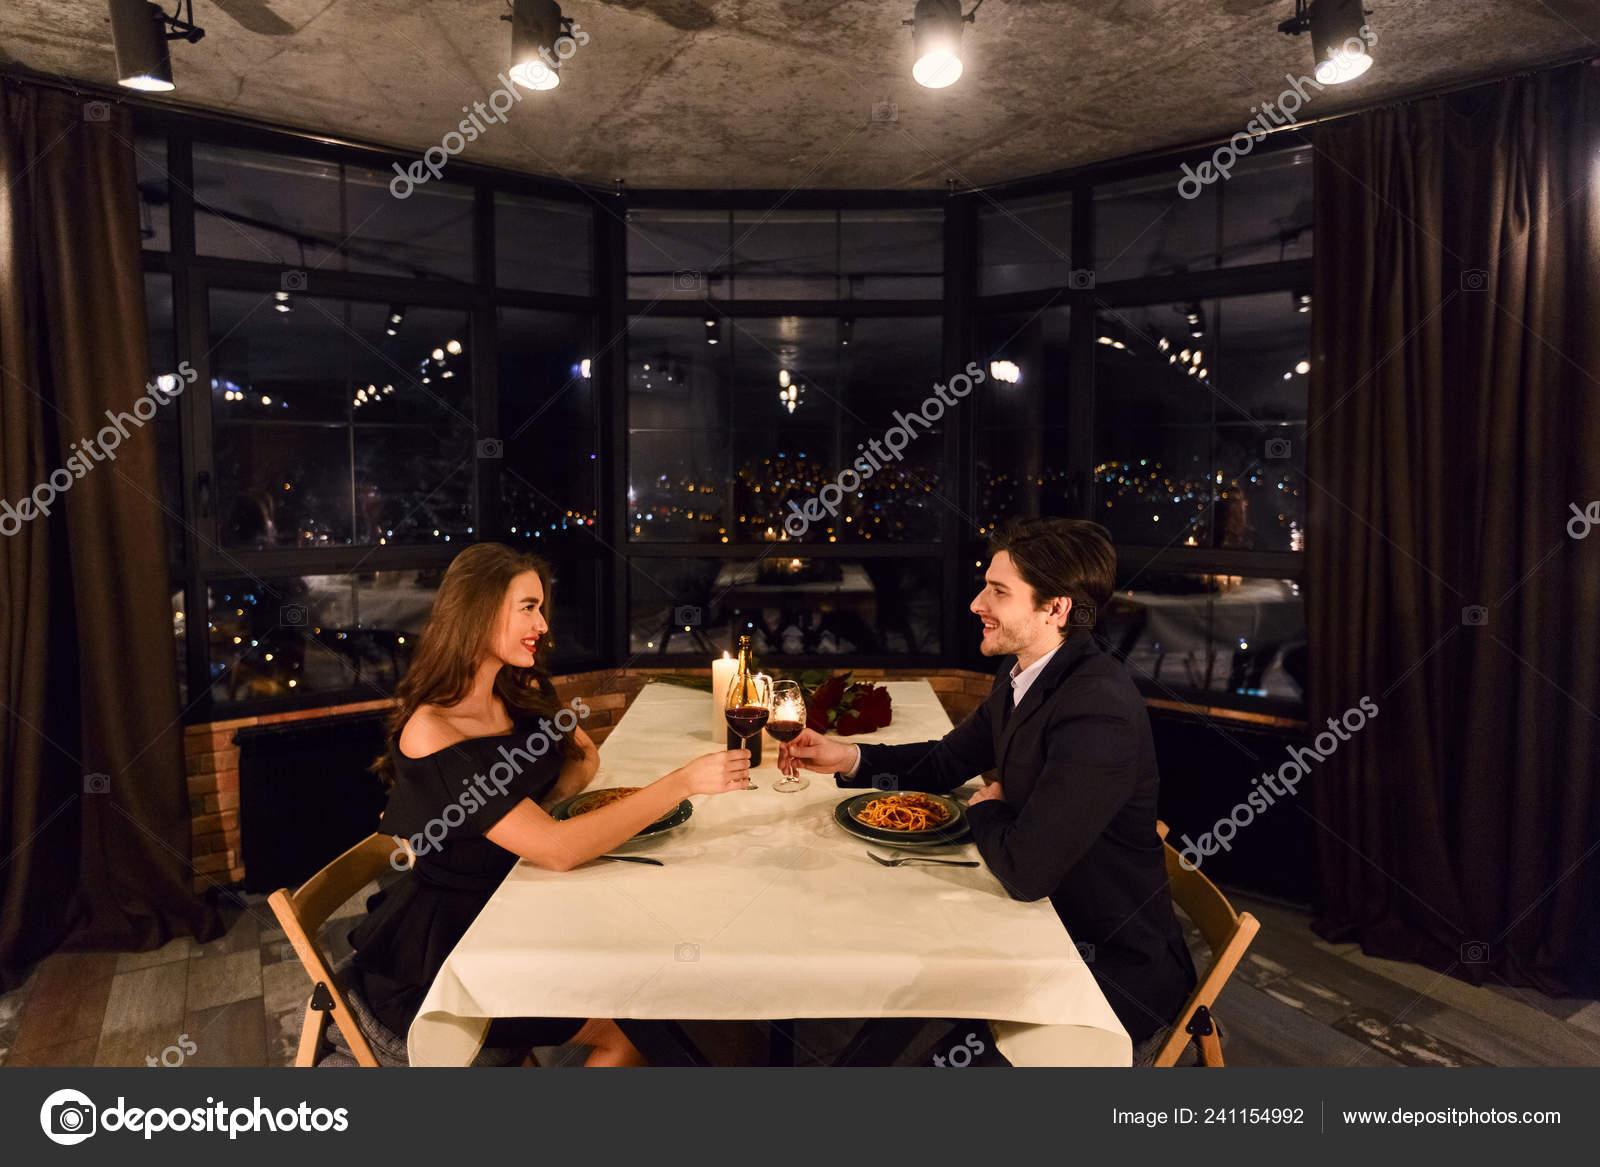 rande s italskými dámamilouisville ky speed dating